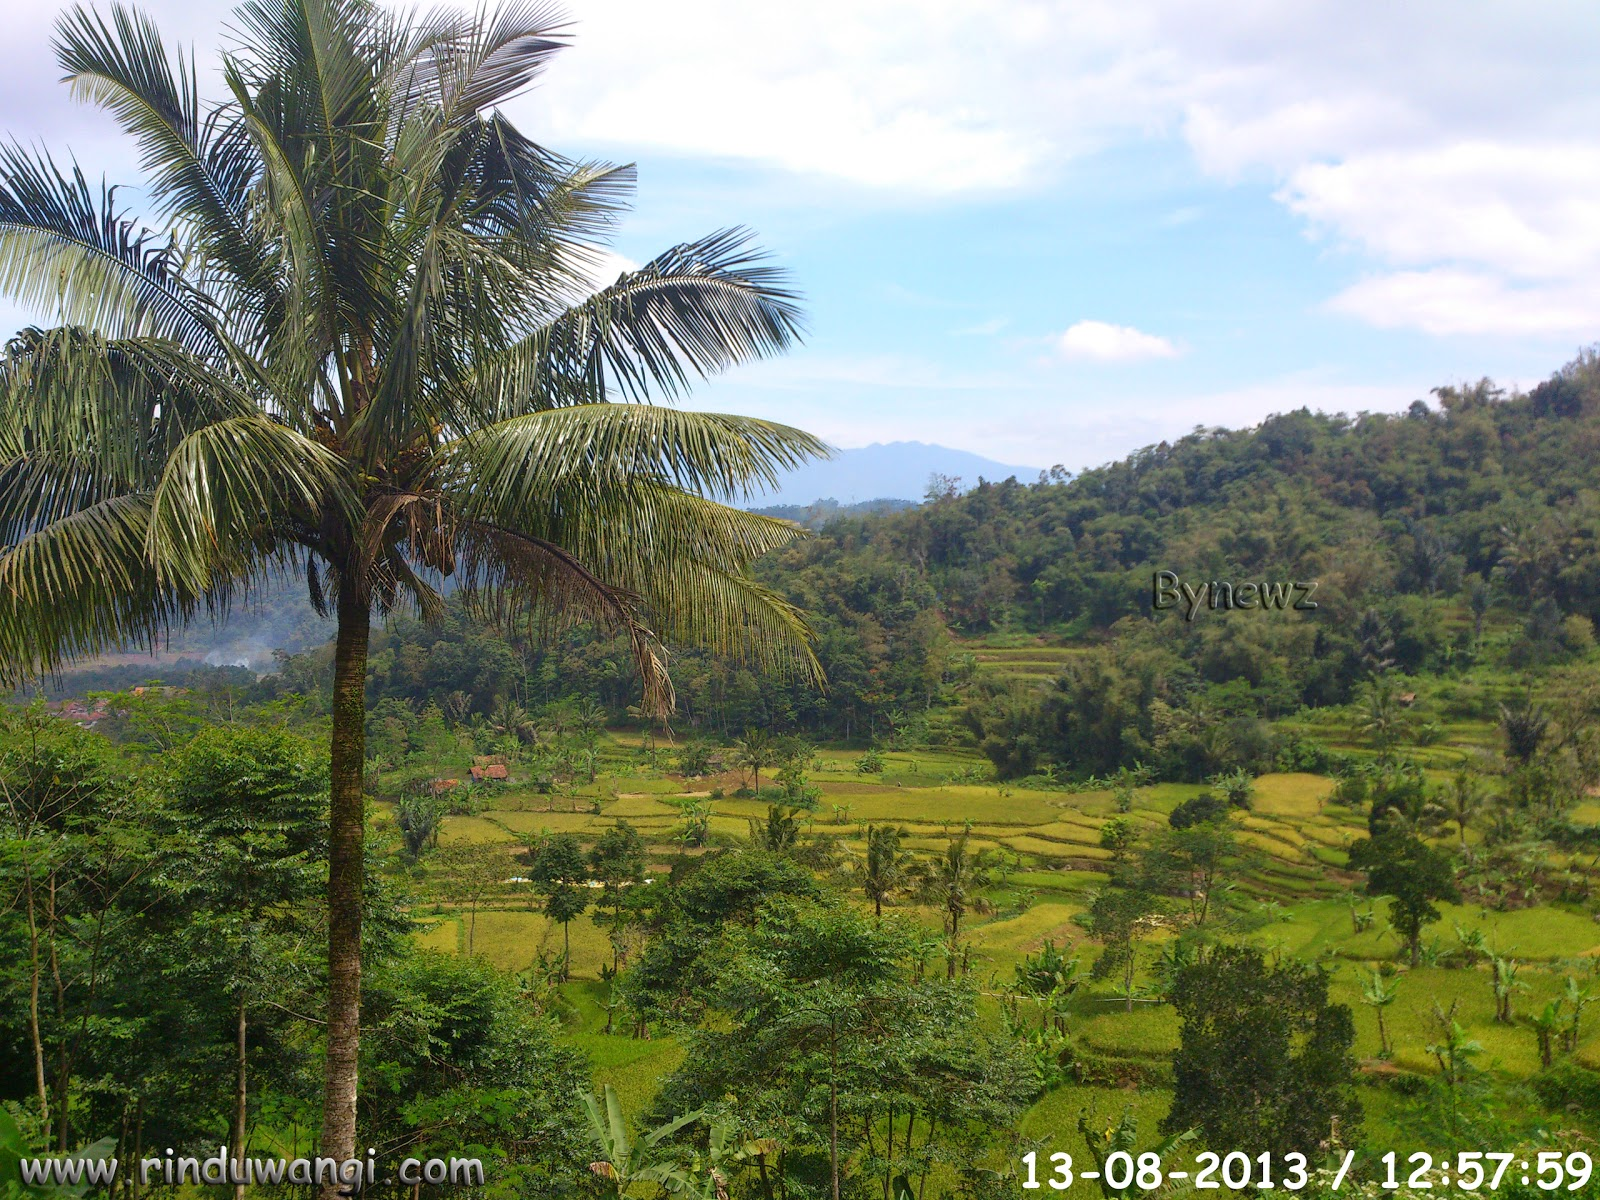 Copyright © Bynewz, Calodas (Rinduwangi) 13 Agustus 2013